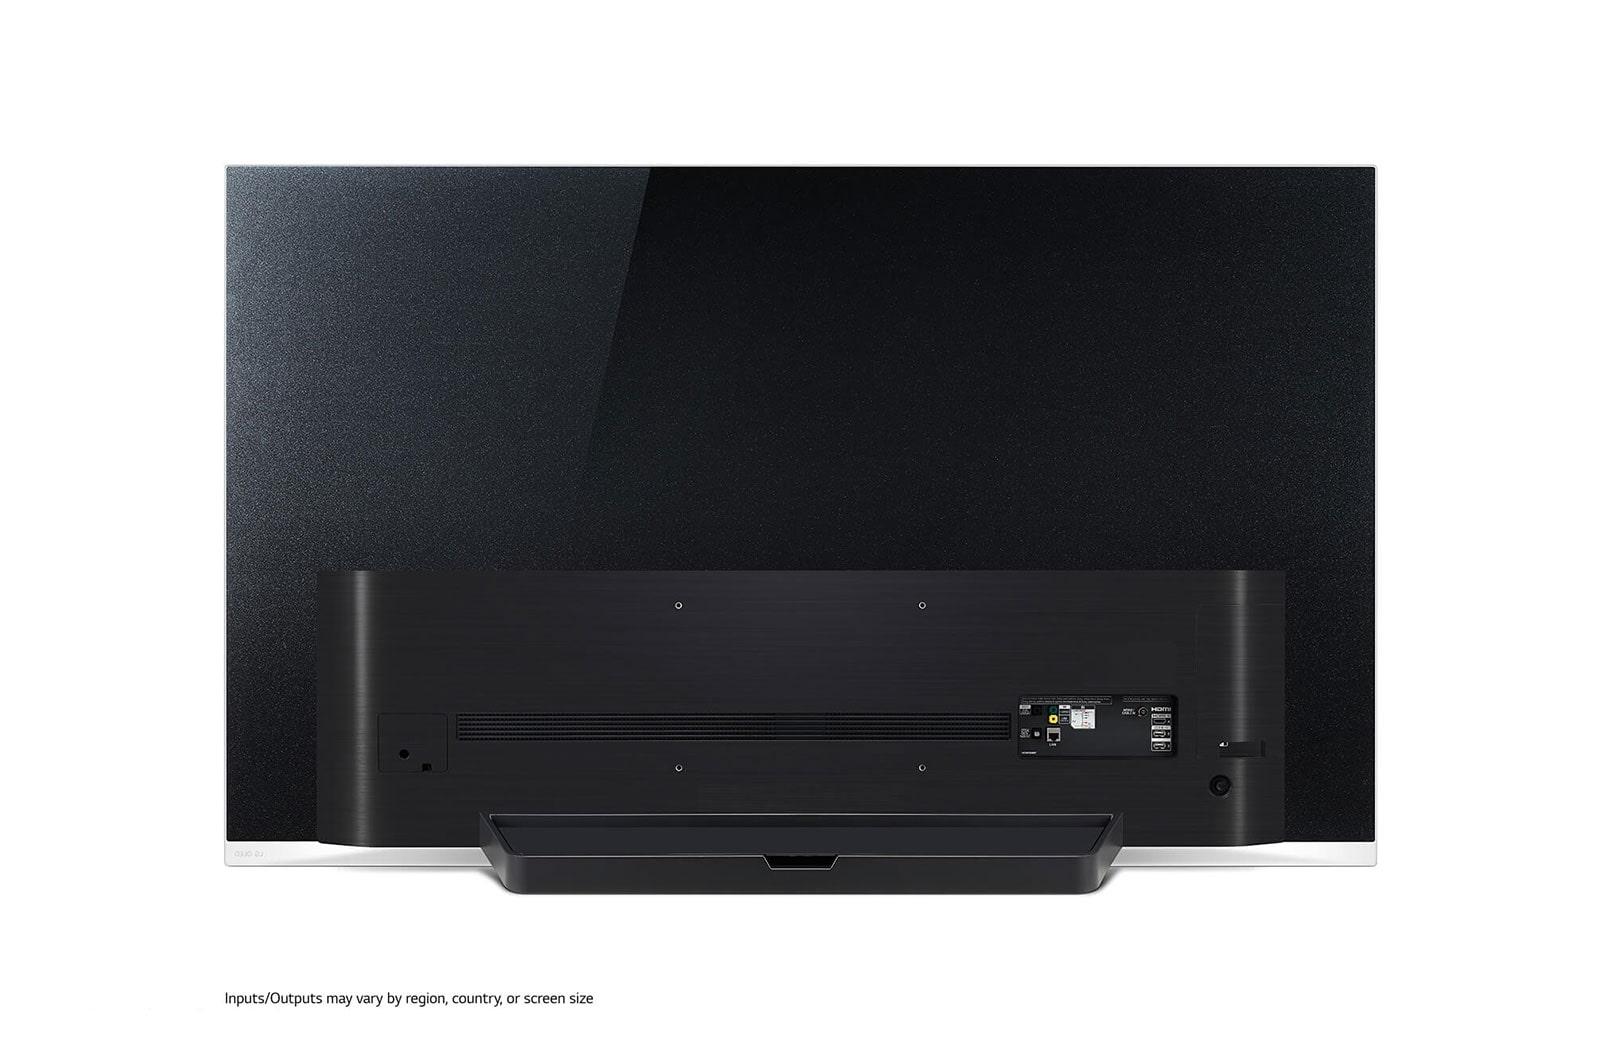 LG TV OLED55E9PLA 5